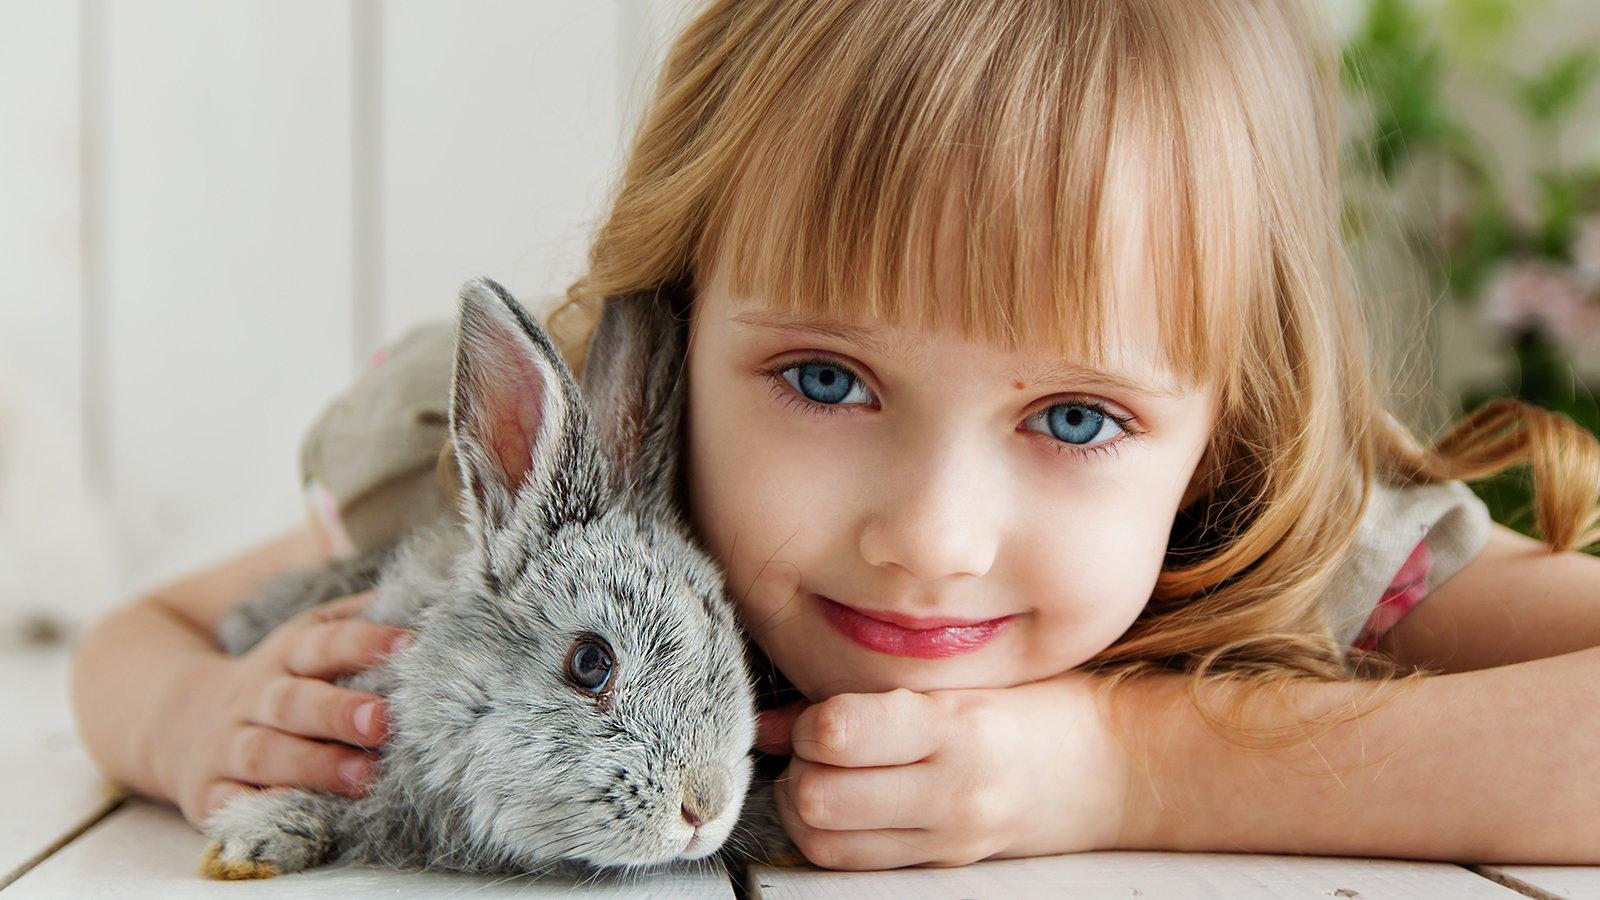 girl with pet rabbit